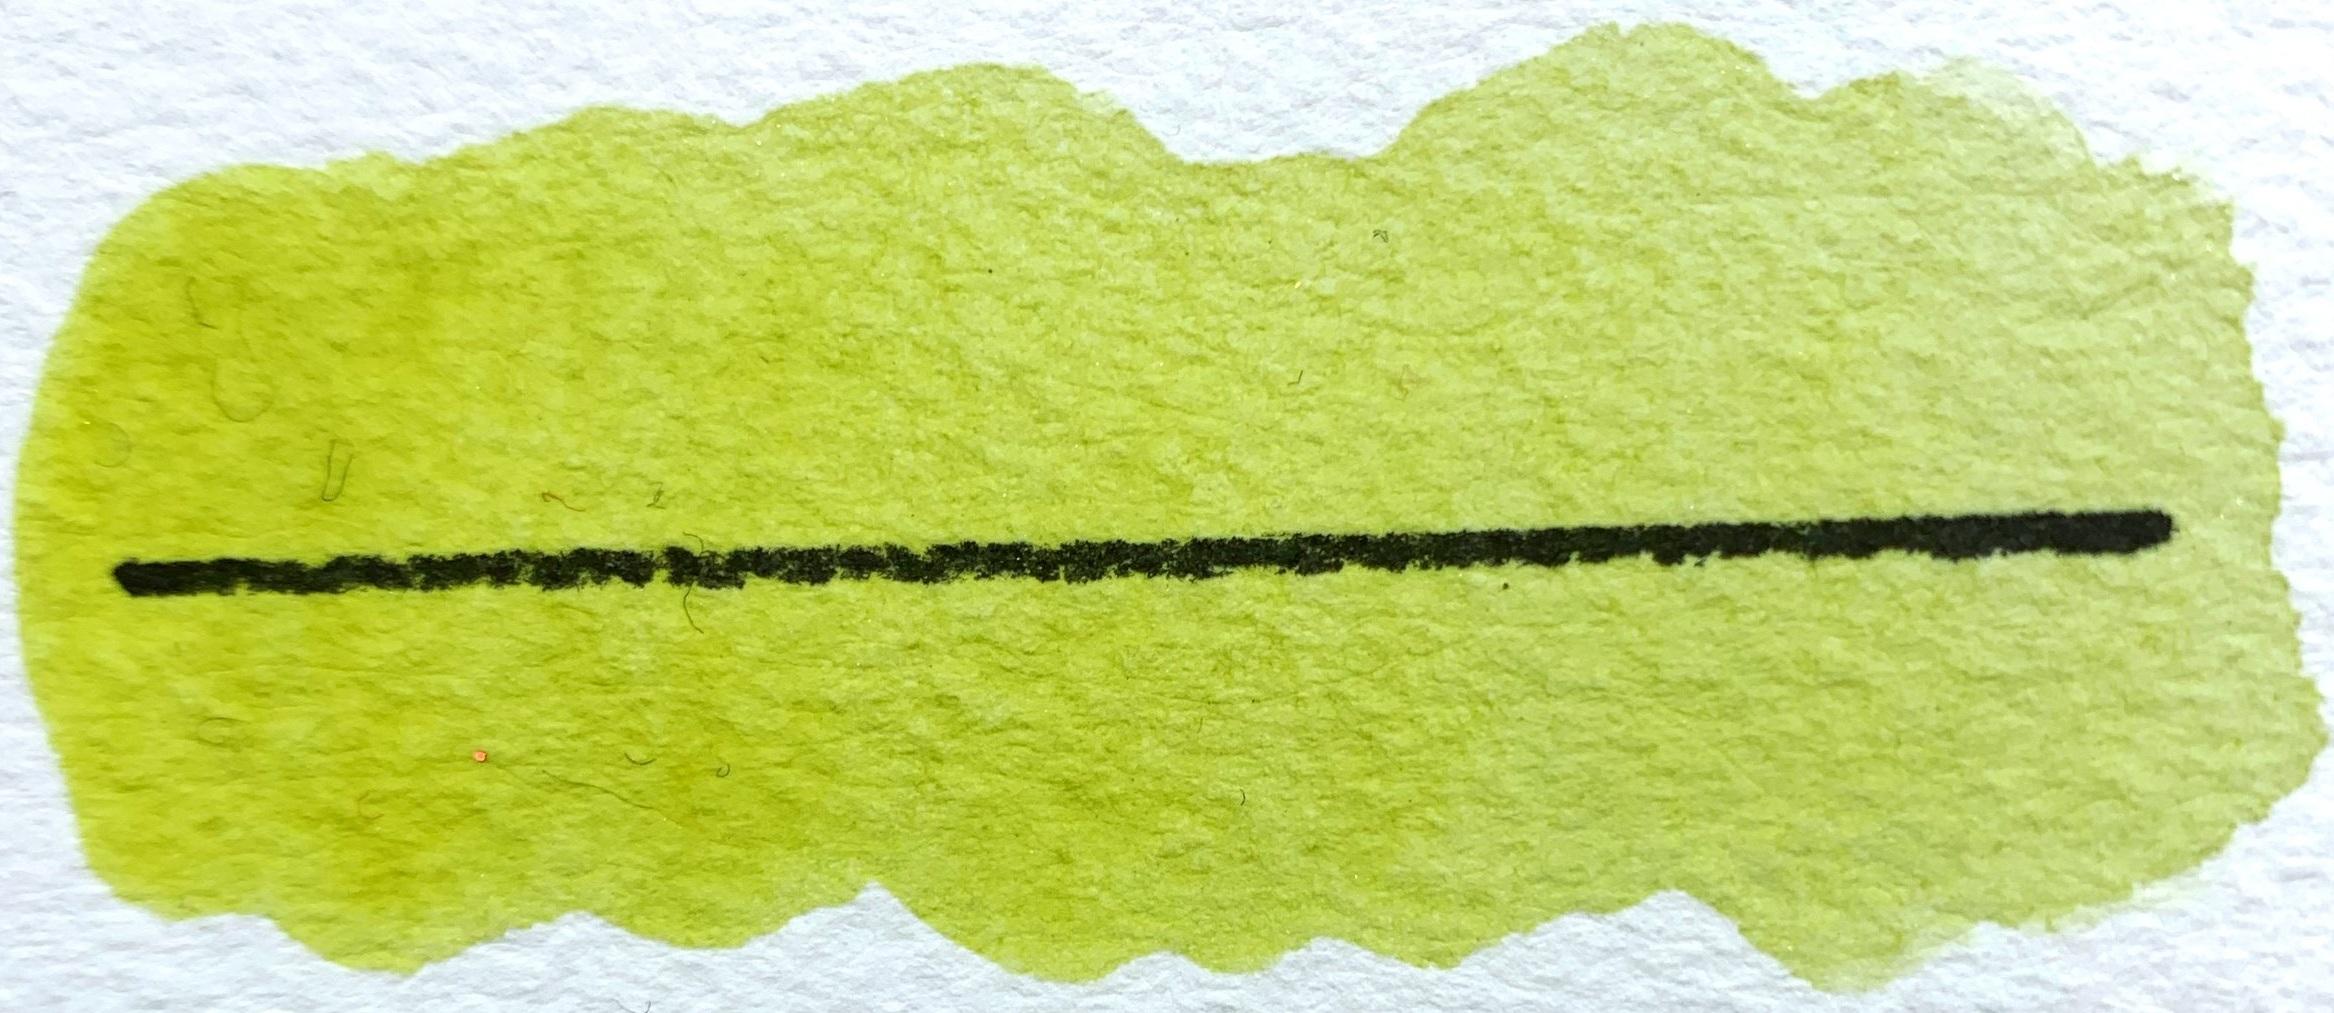 Mayan Yellow - PY223, transparent, good lightfastness, nonstaining